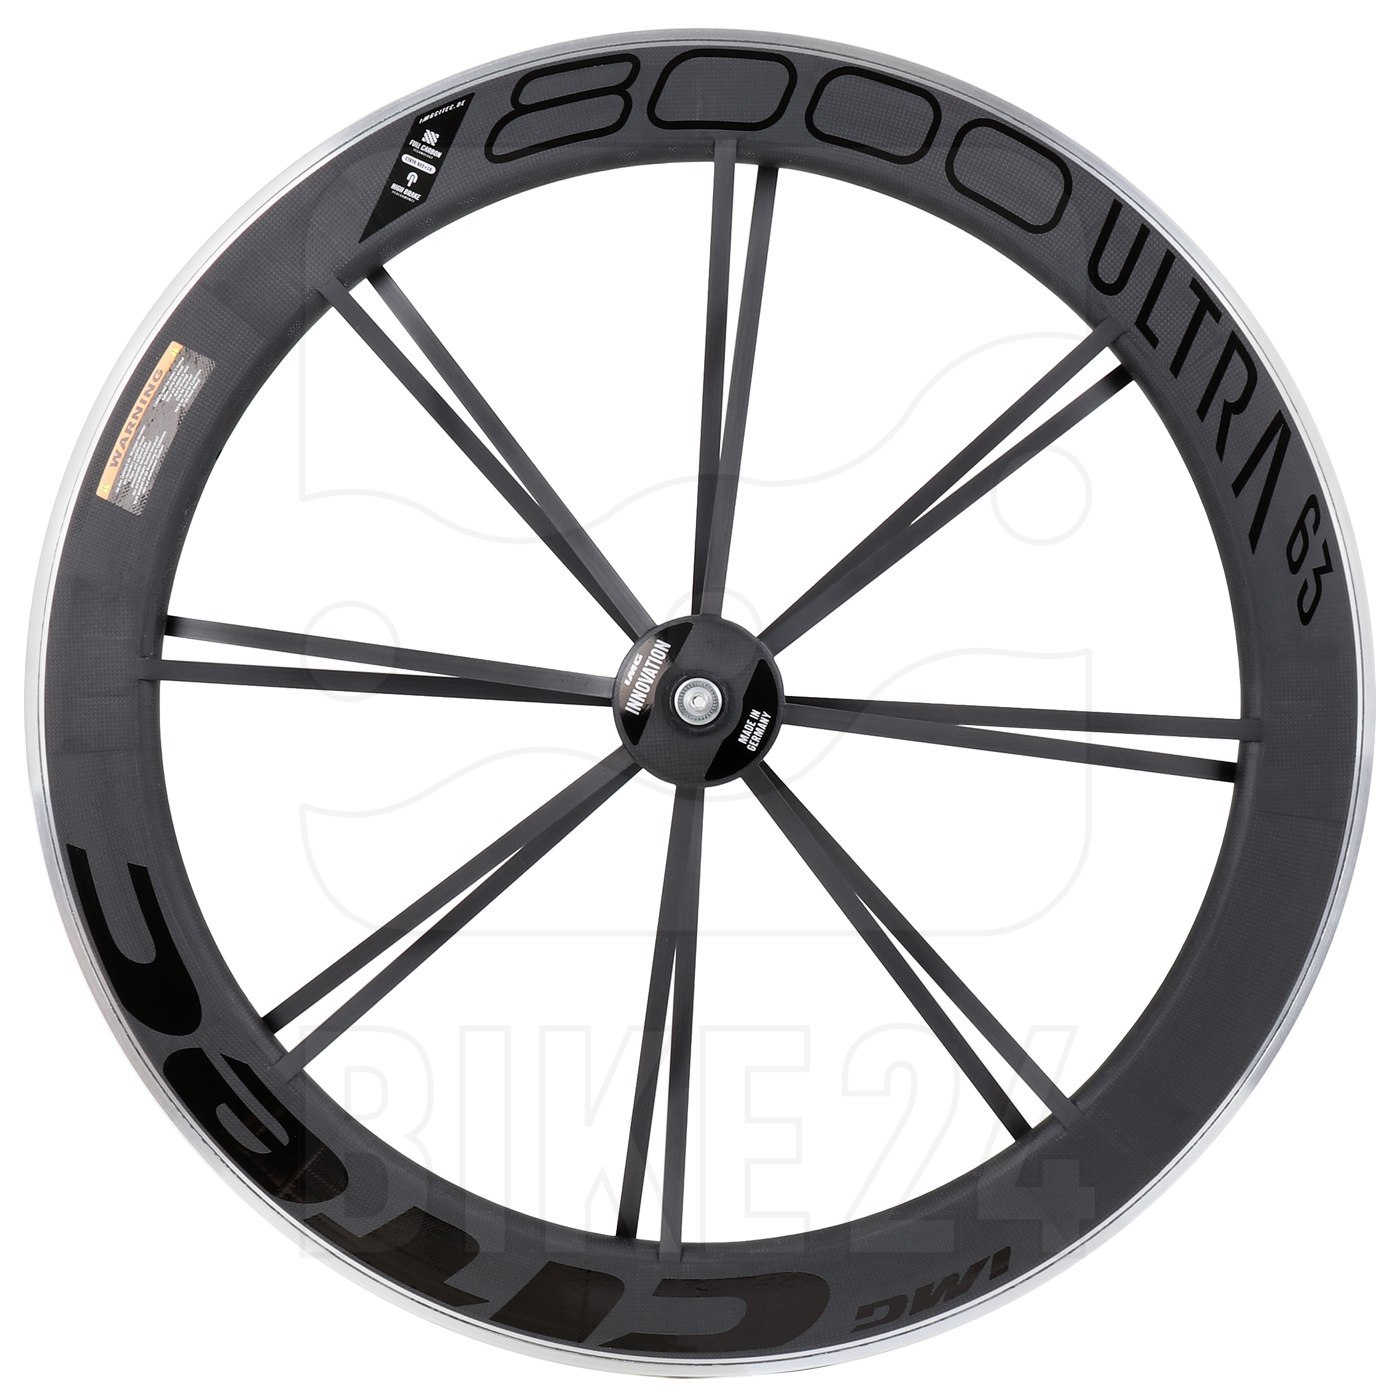 CITEC 8000 SL / 63 Ultra 28 Inch Front Wheel - Clincher - 9x100mm QR - black